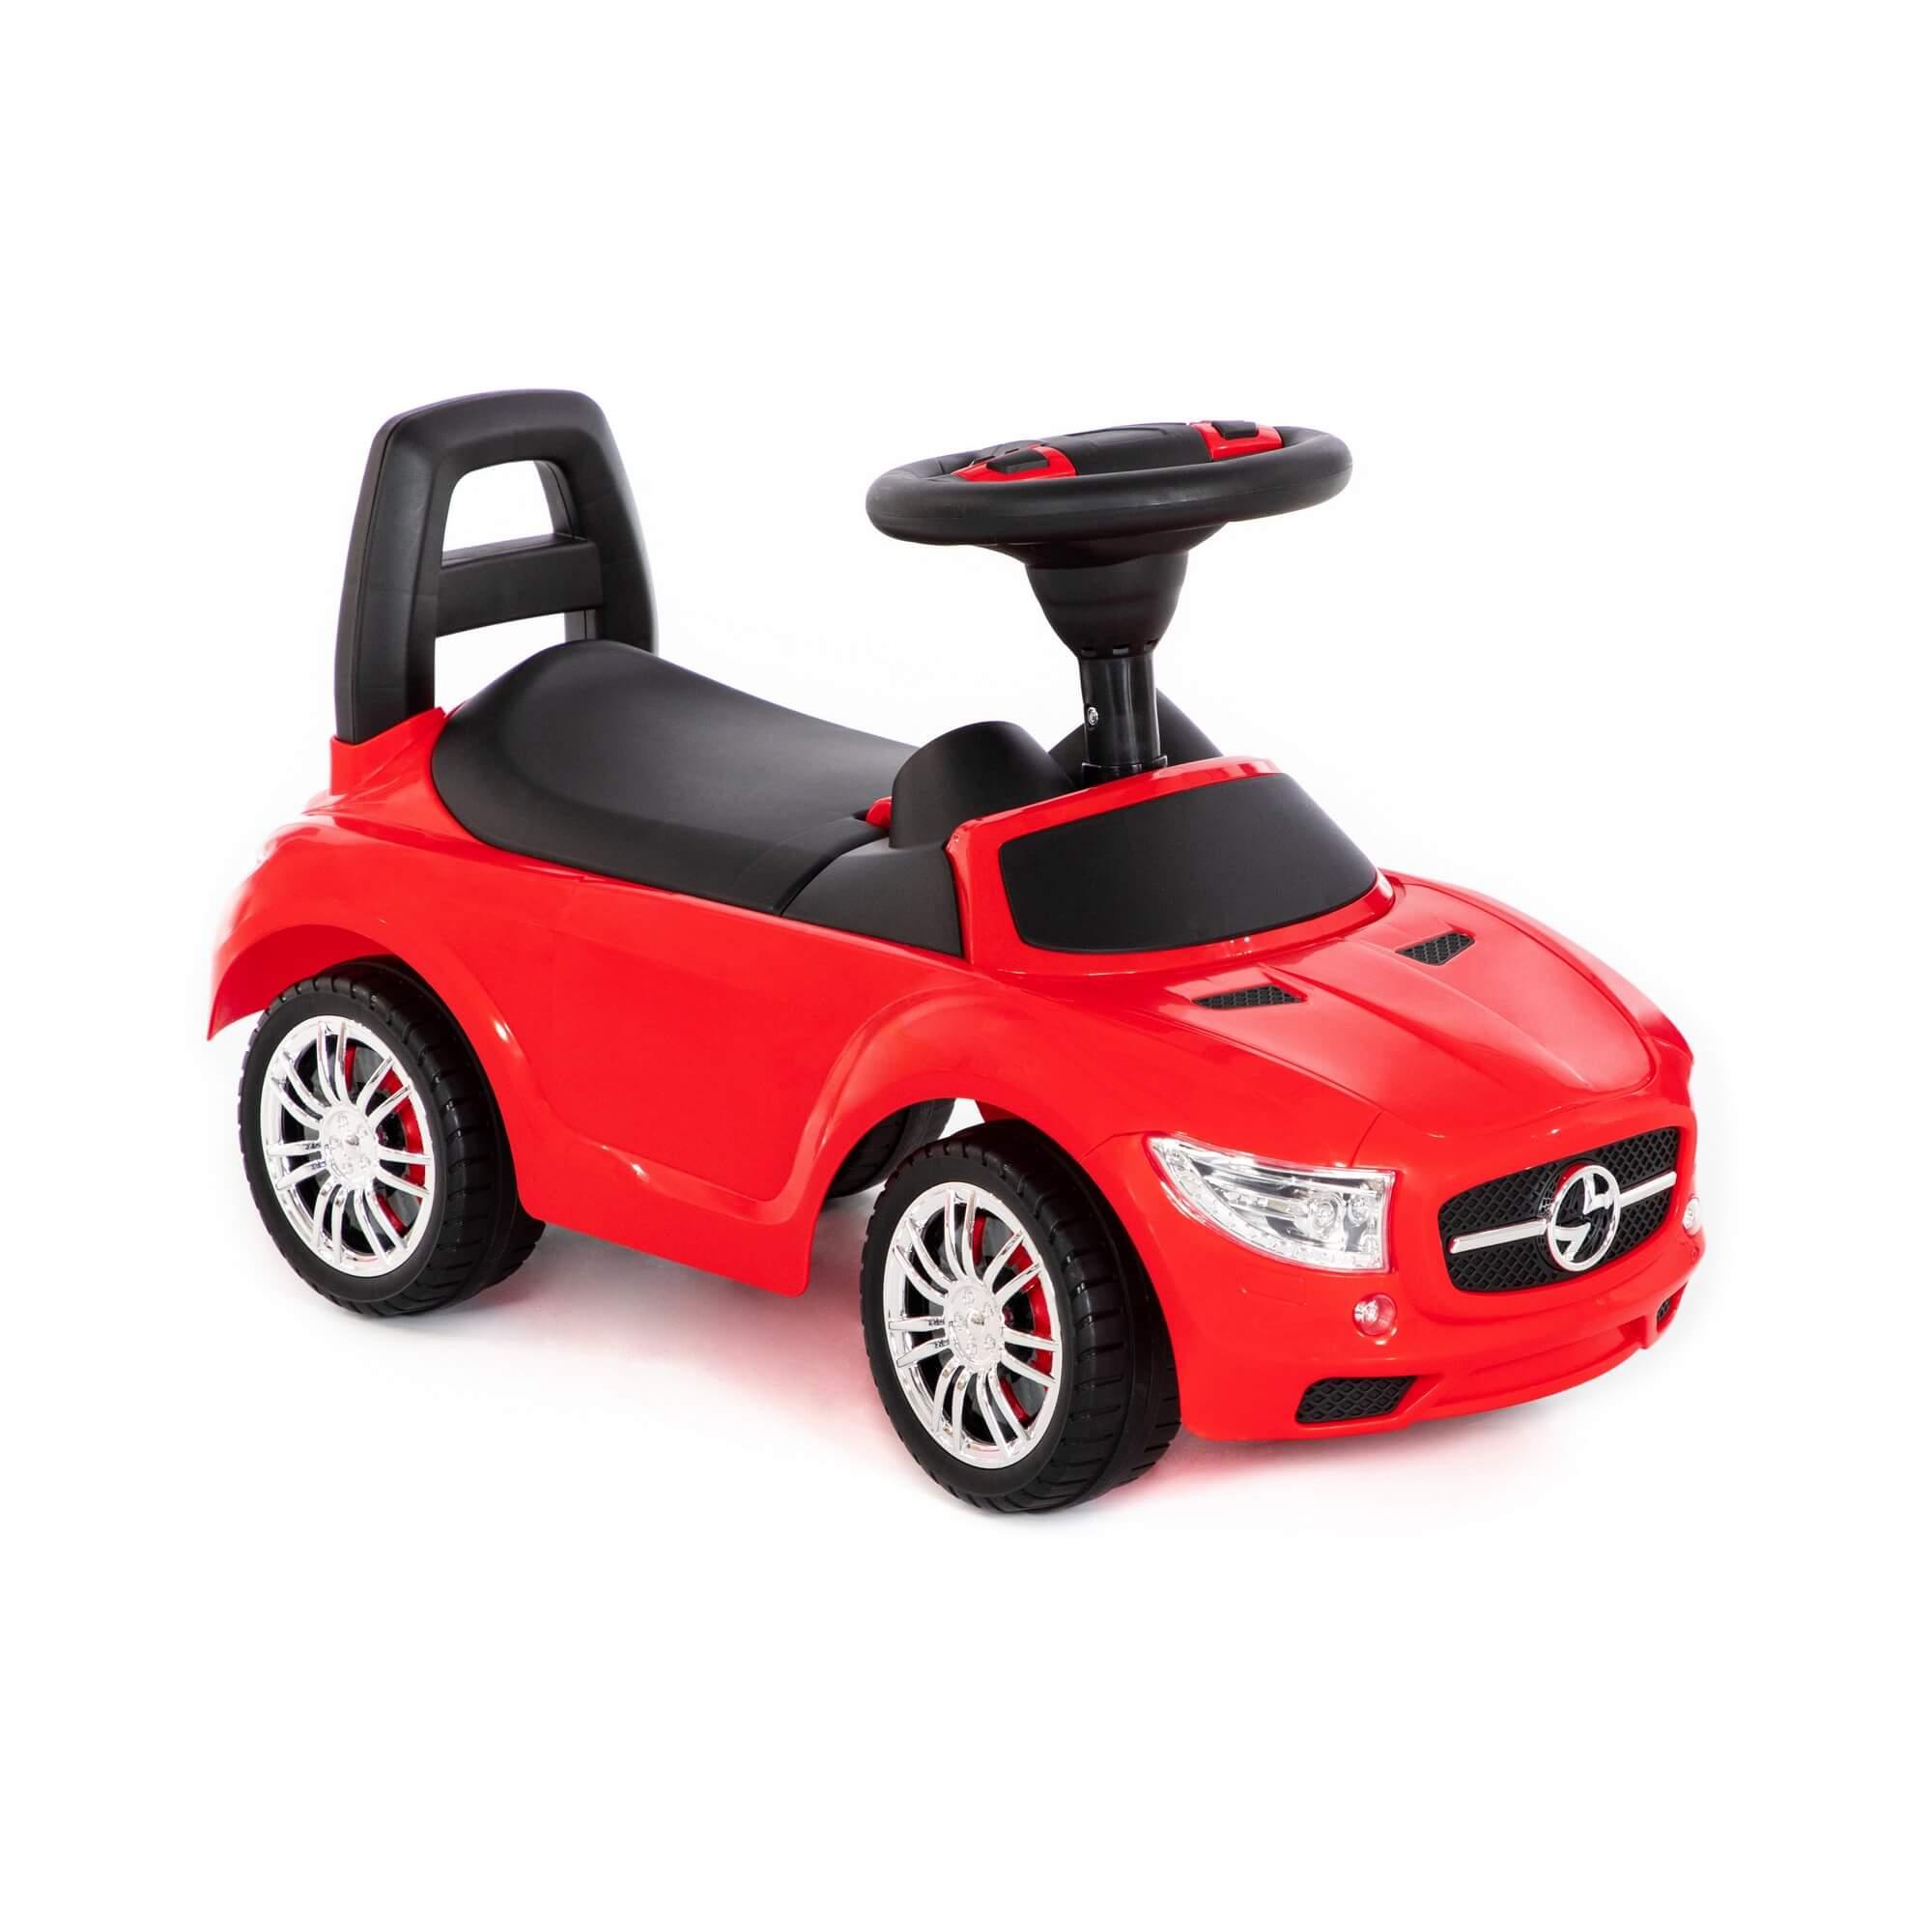 SuperCar sürümeli araba No:1 ses sinyali ile (pembe) Ref. 84460 - photo #6